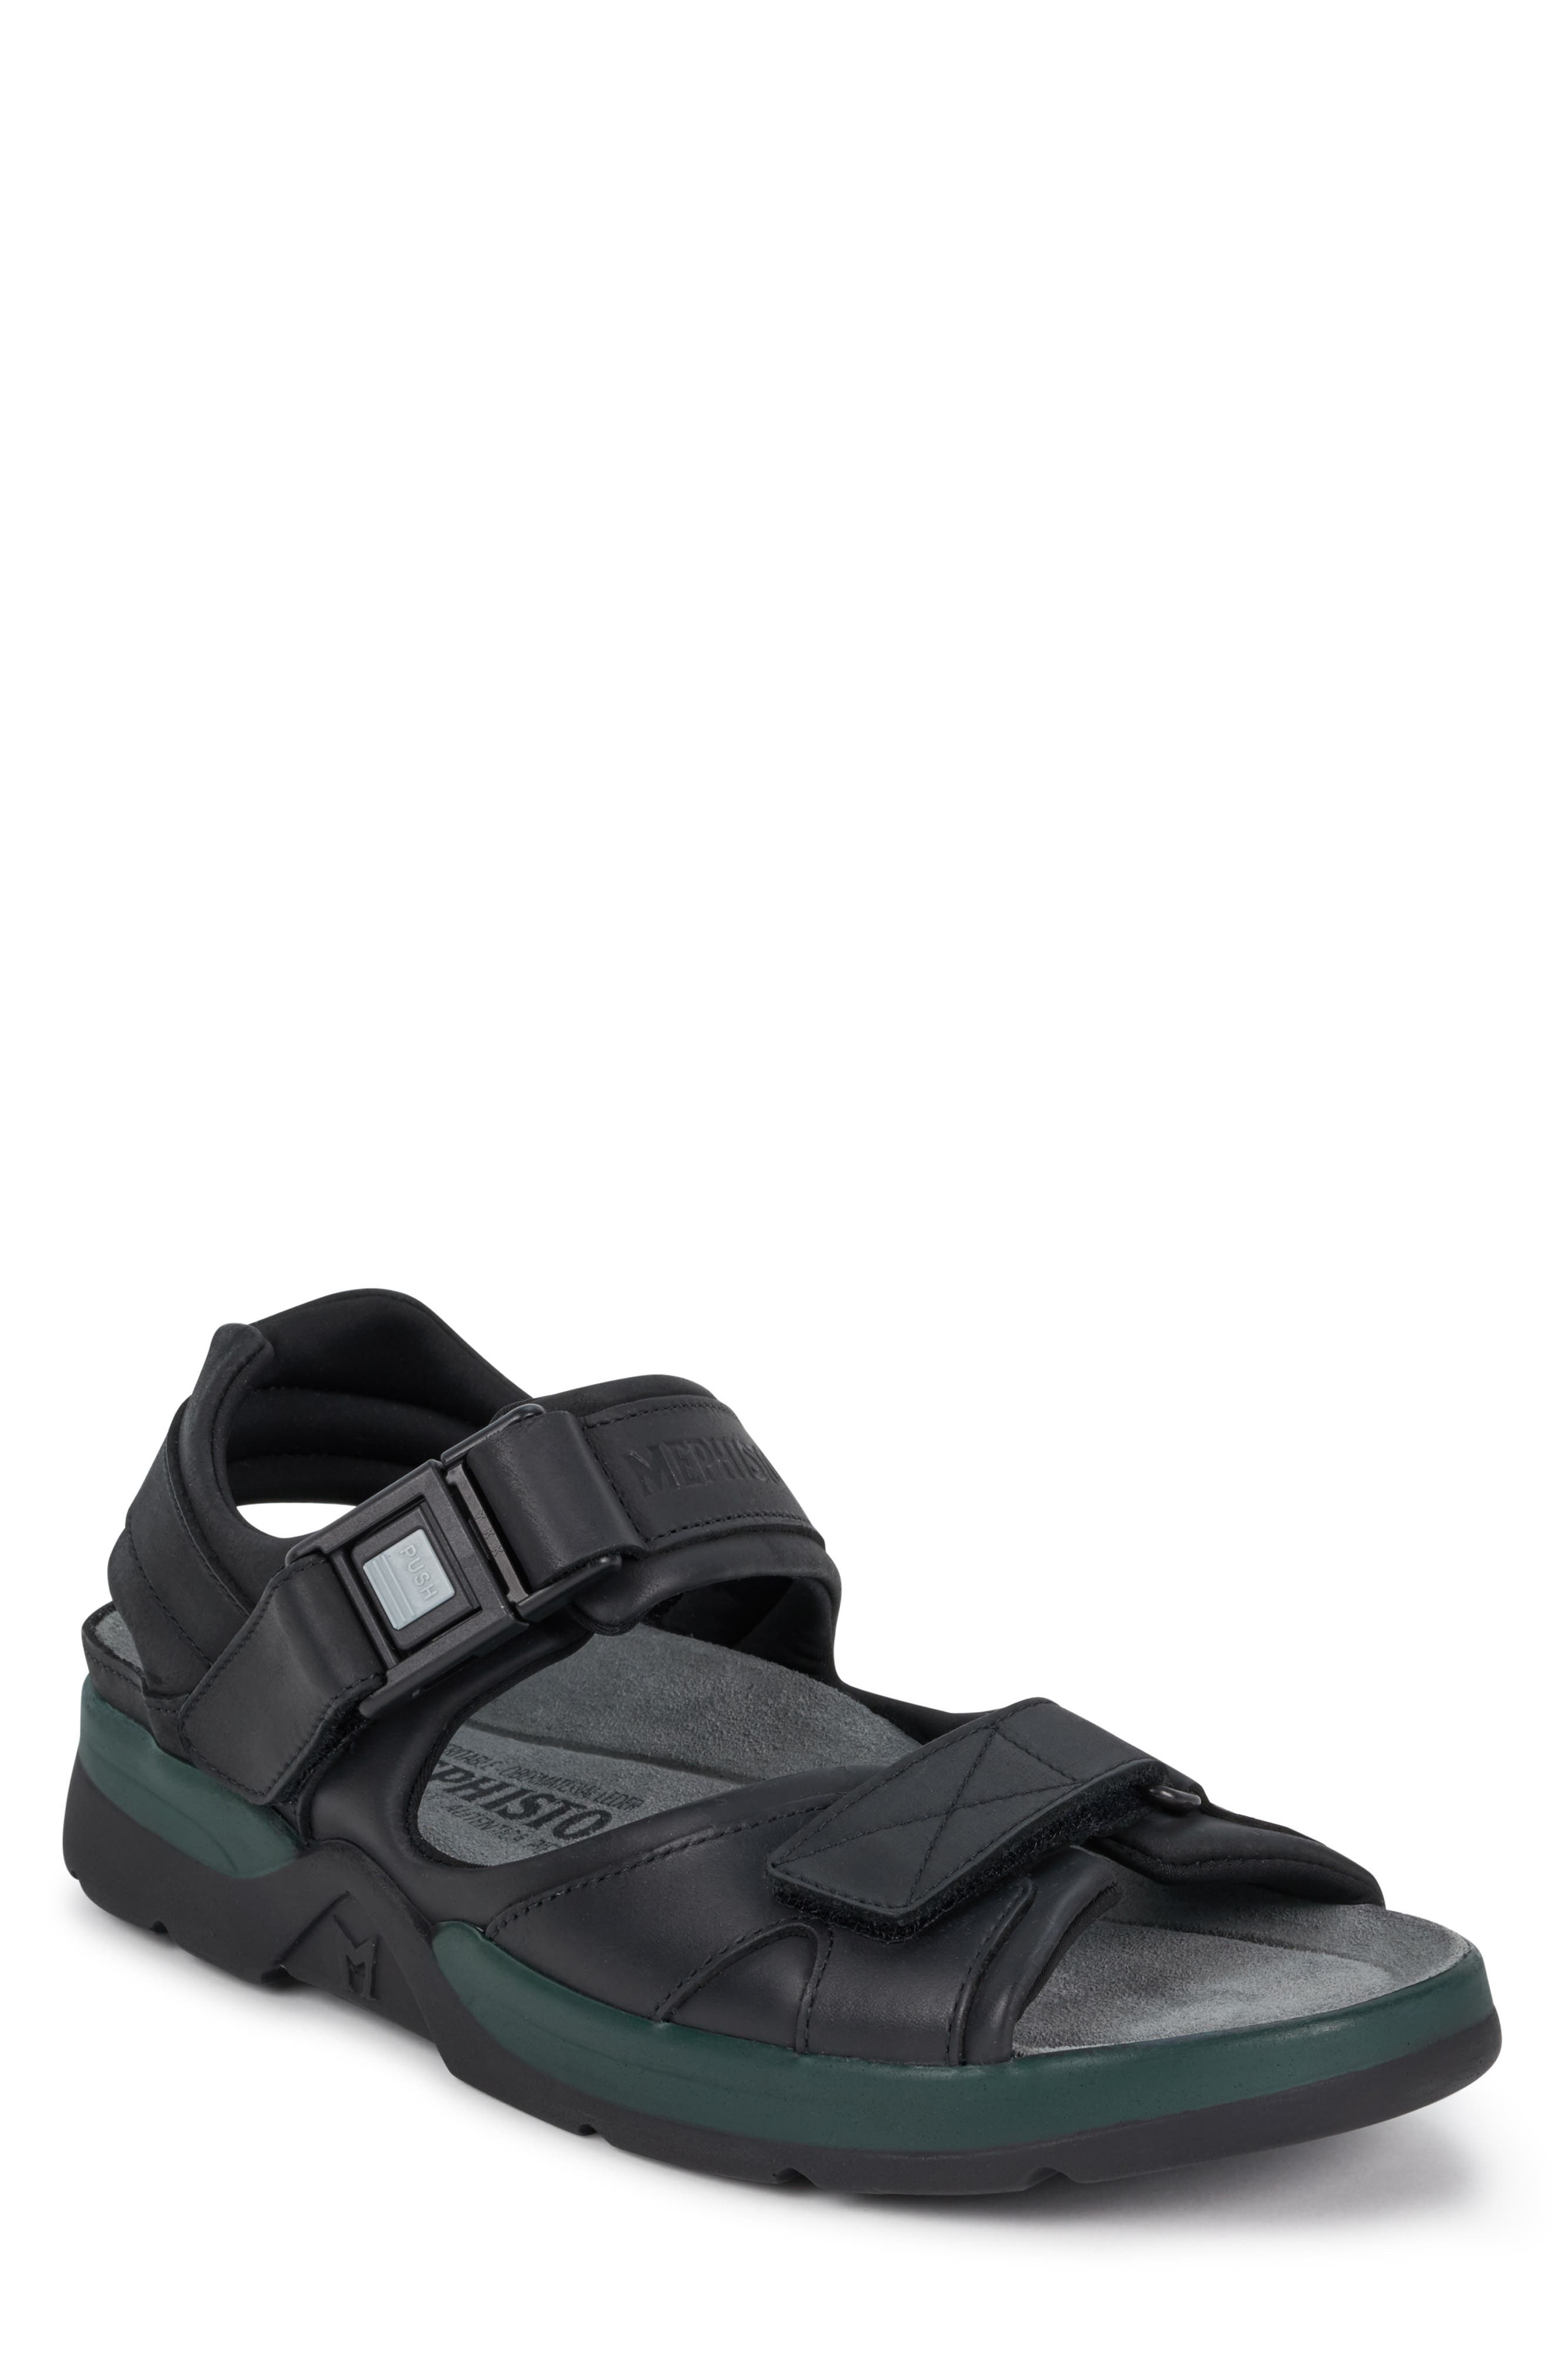 MEPHISTO, 'Shark' Sandal, Main thumbnail 1, color, BLACK WAXED LEATHER